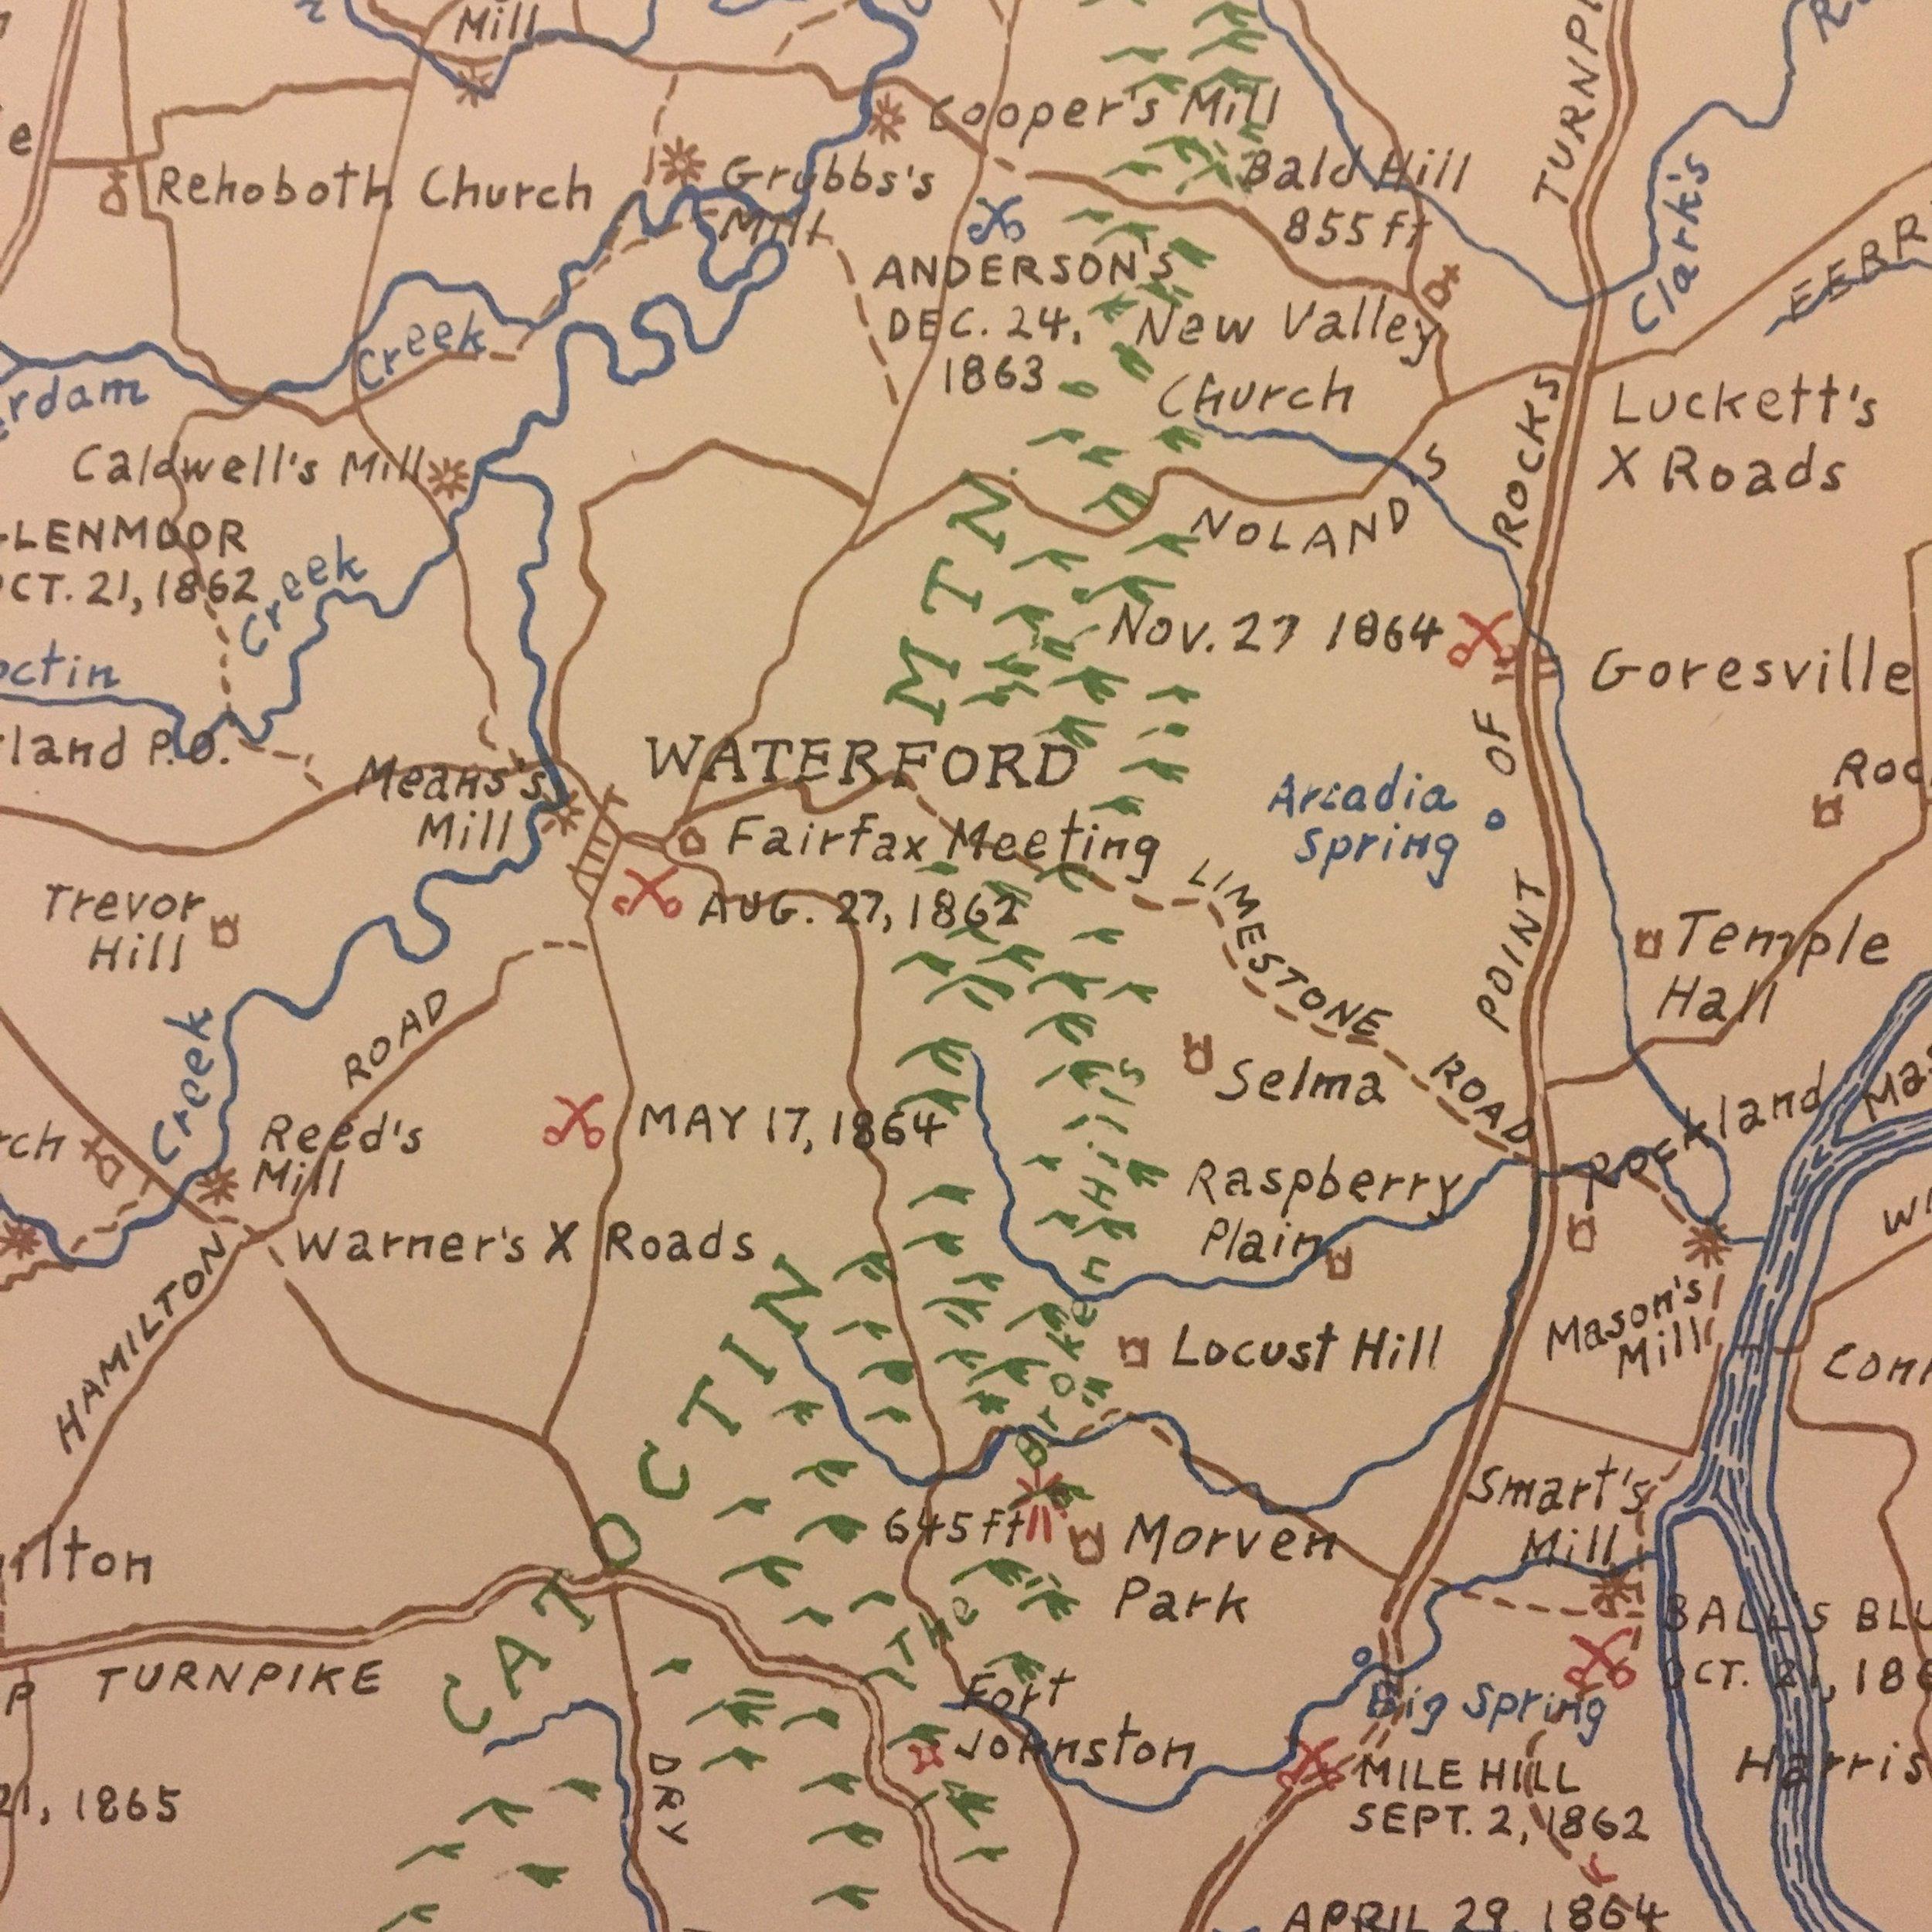 Hand drawn map of Waterford, Virginia by Eugene Scheel